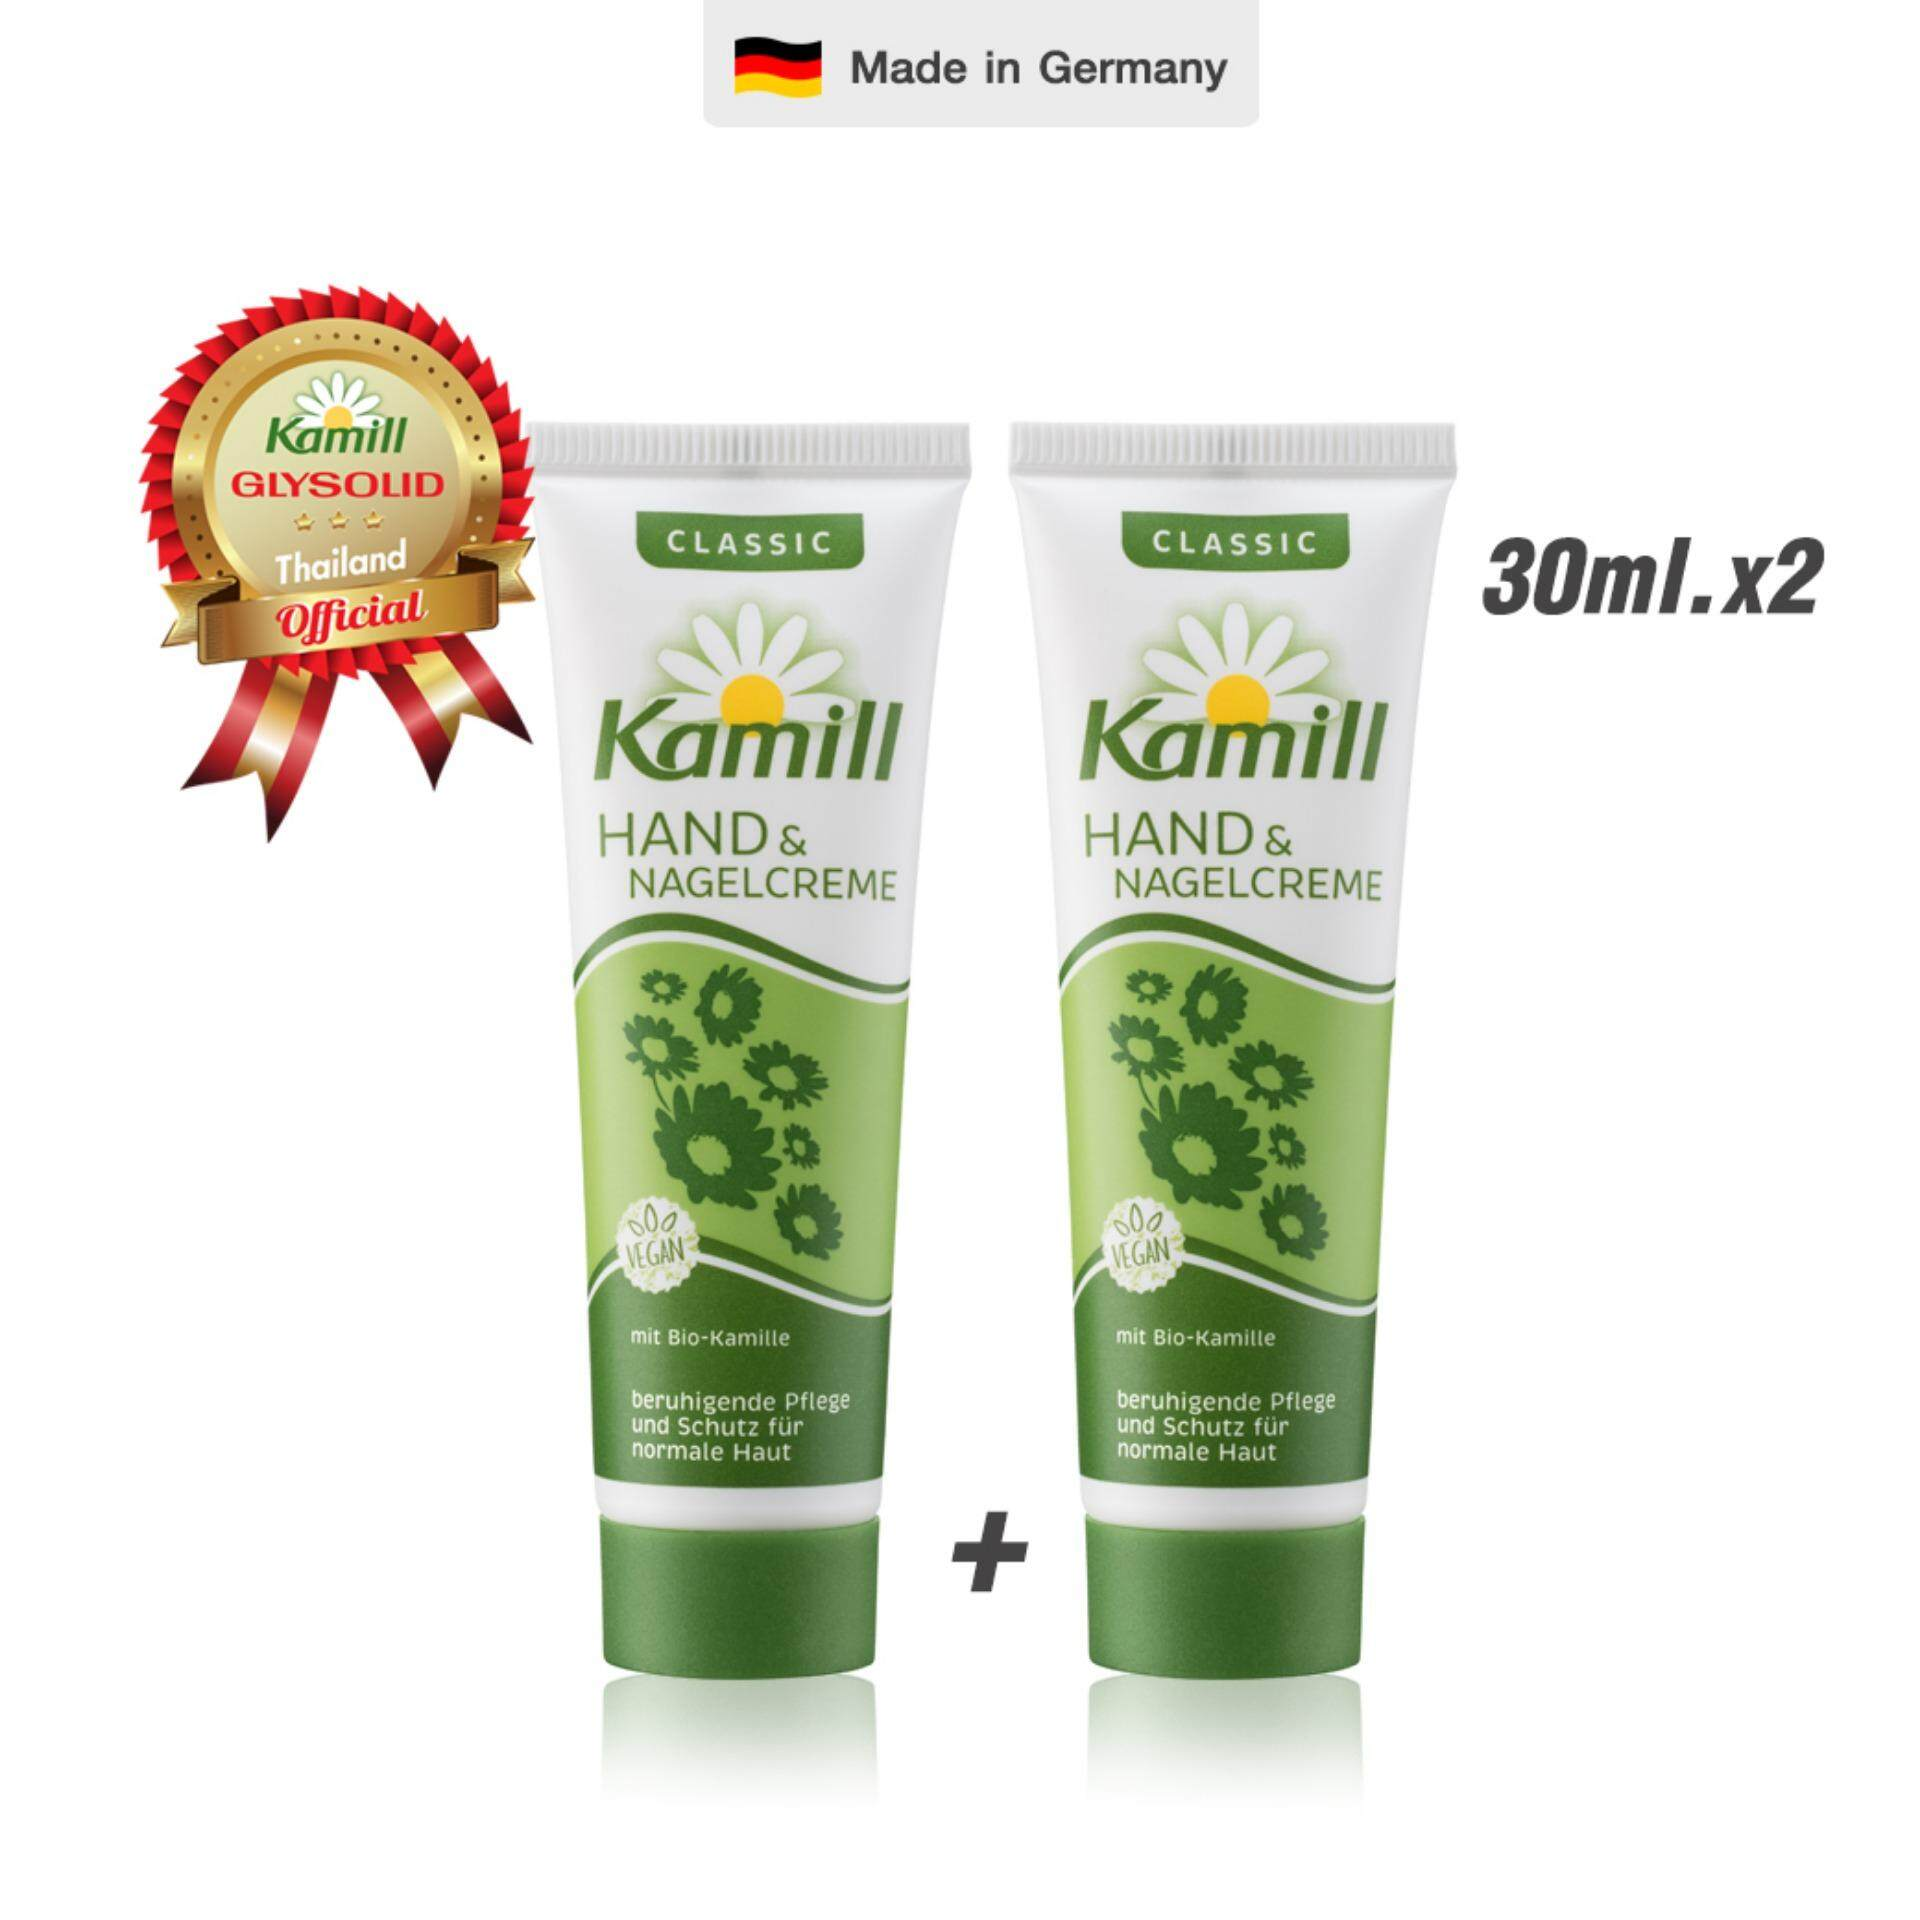 BUY 1 GET 1 FREE Kamill Hand & Nail Cream Classic 30 ml. (คามิล แฮนด์ แอนด์ เนล ครีม สูตร คลาสสิค 30 มล.)